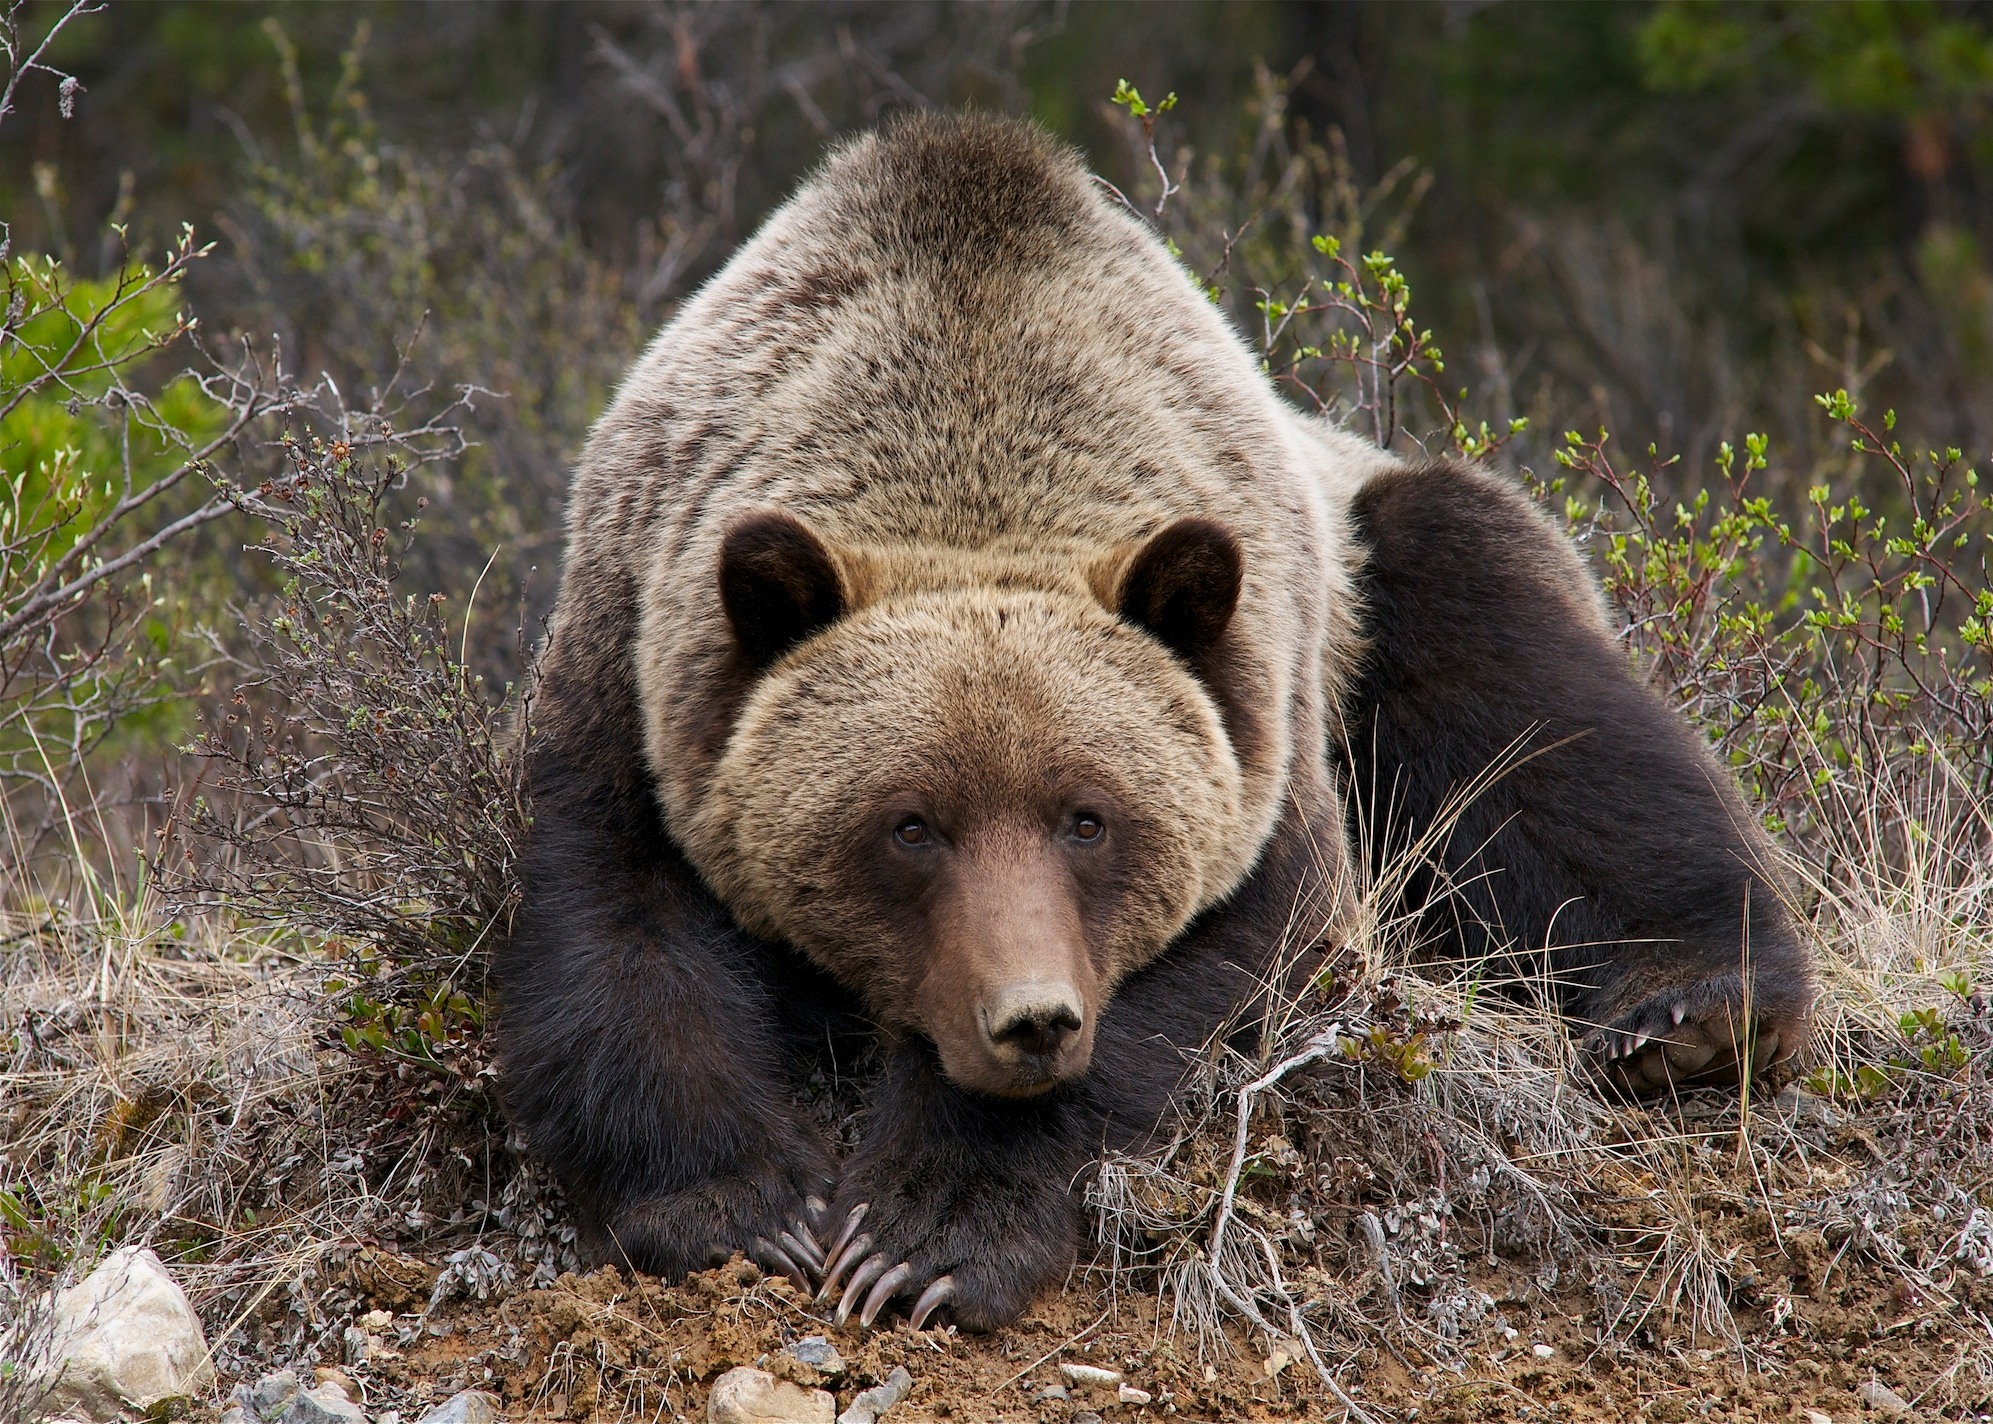 Unbound bear getting hard rod